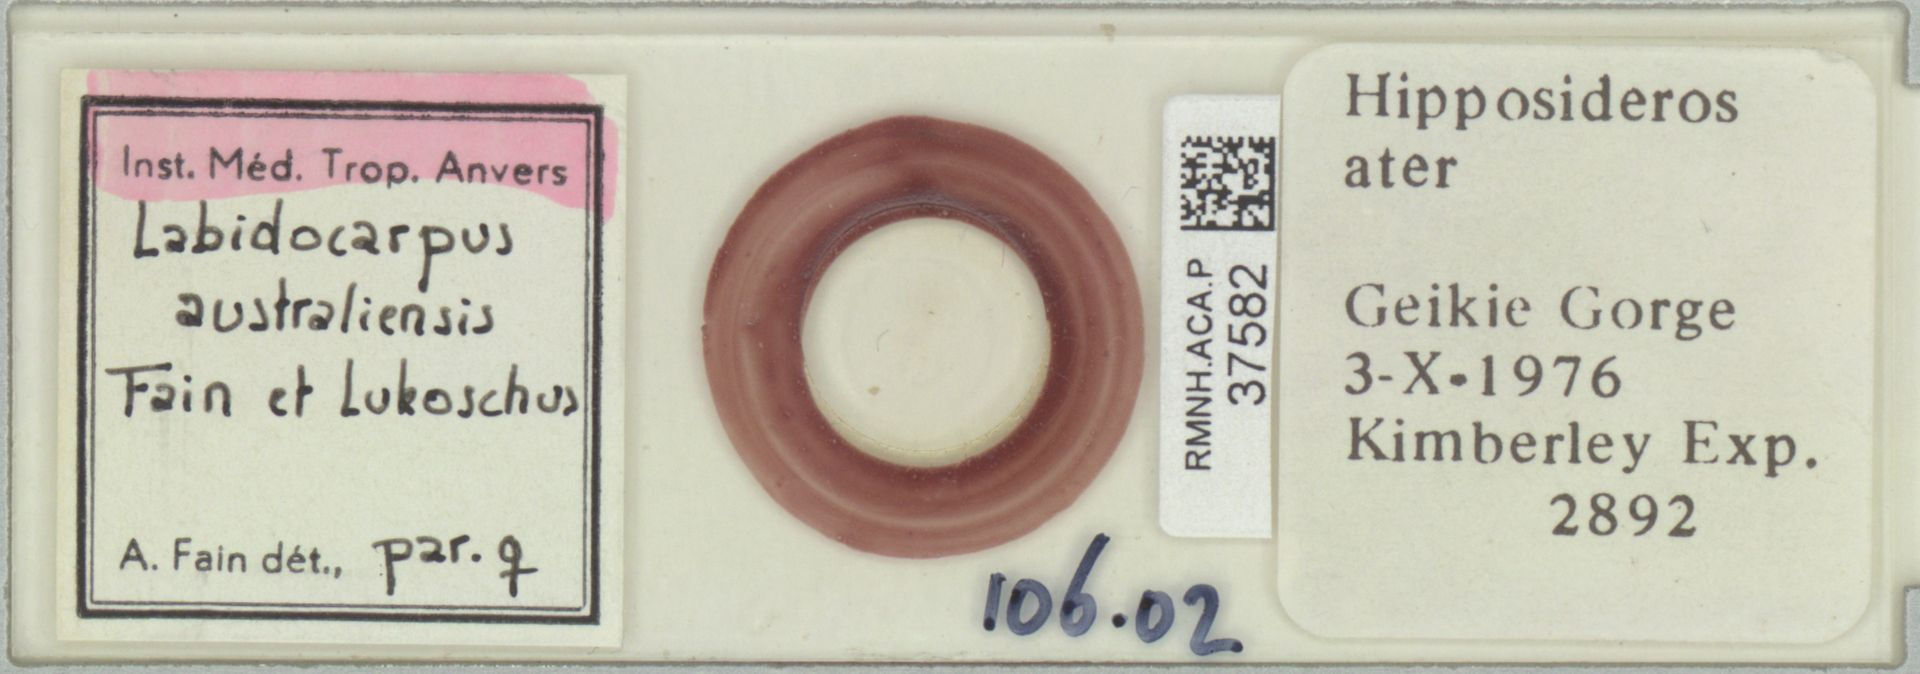 RMNH.ACA.P.37582 | Labidocarpus australiensis Fain & Lukoschus